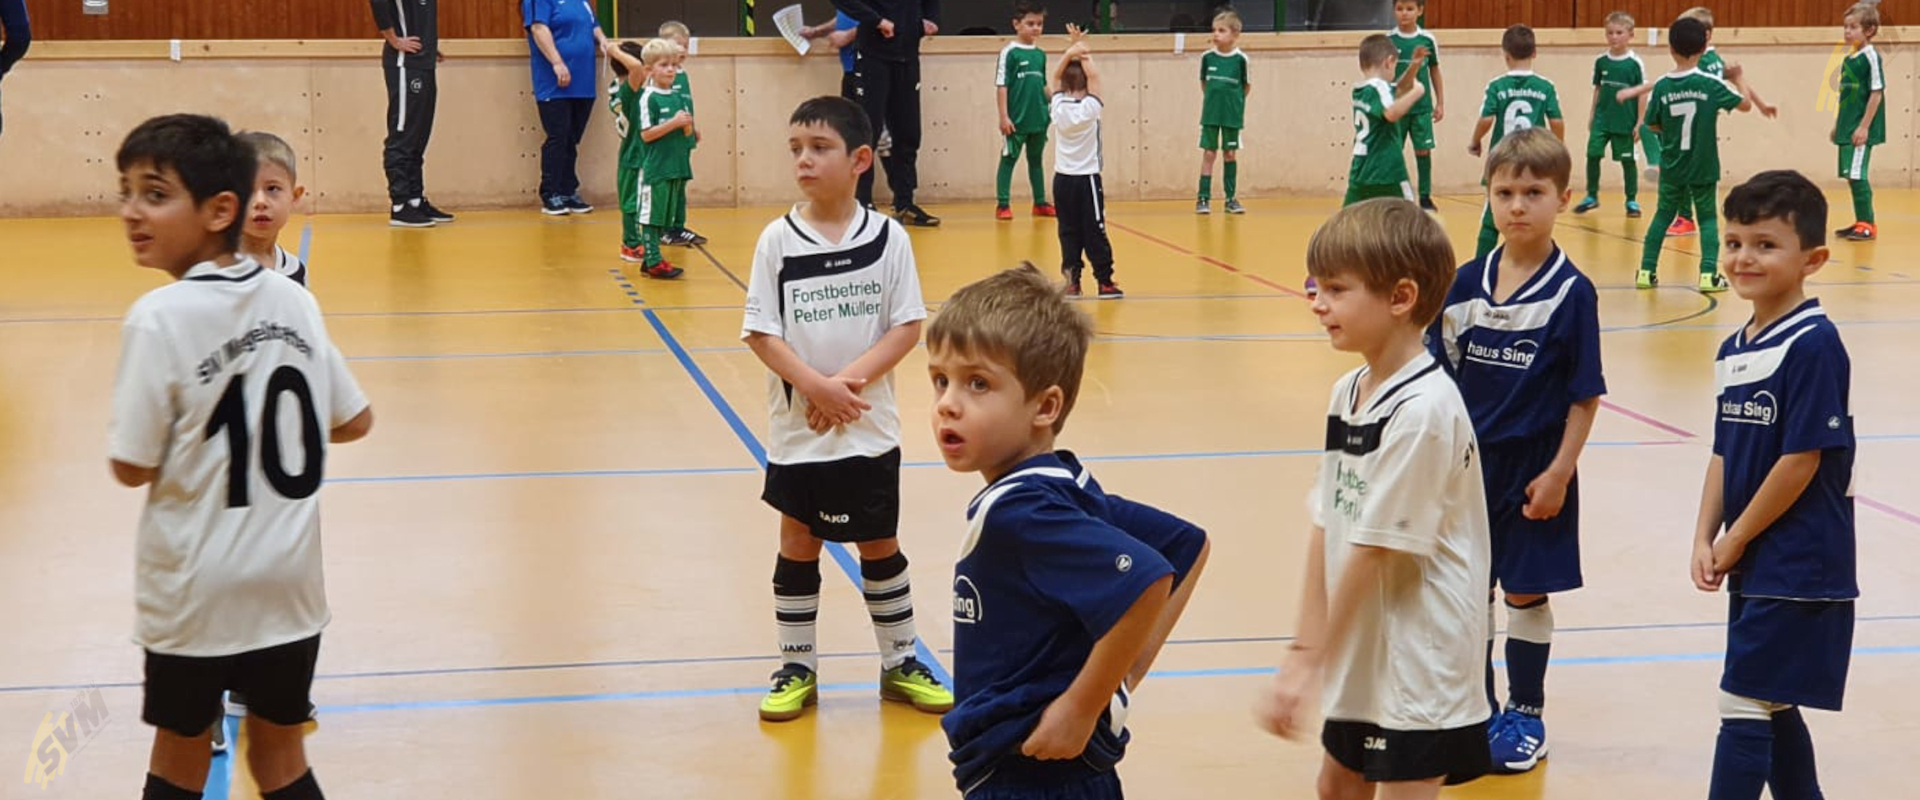 2021 - Header - Fussball - Bericht - Bambini-Training